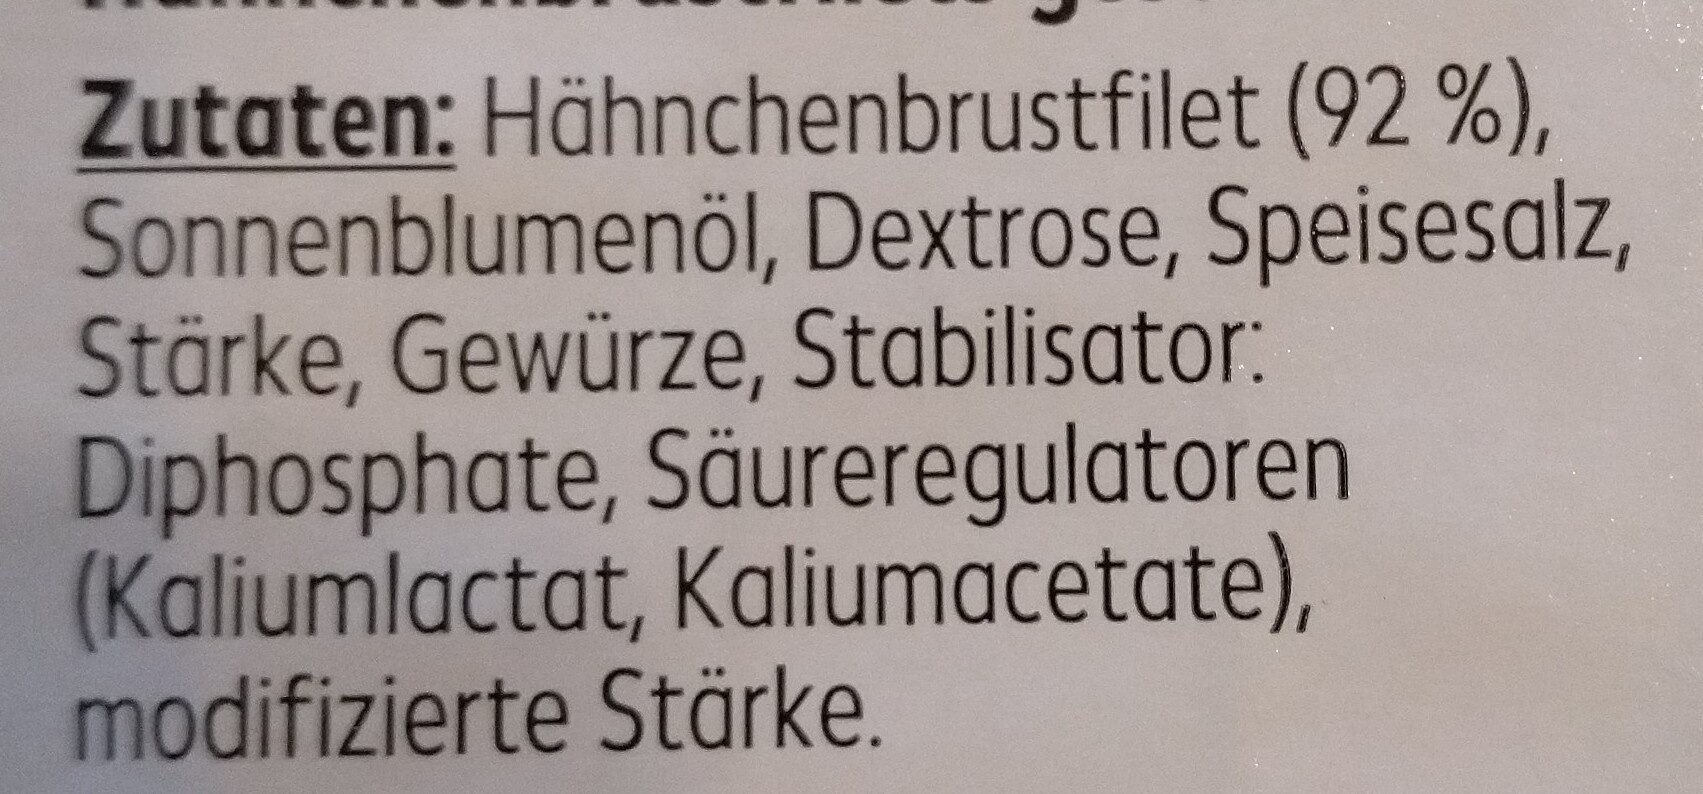 Hähnchenbrustfiletstreifen - Zutaten - de